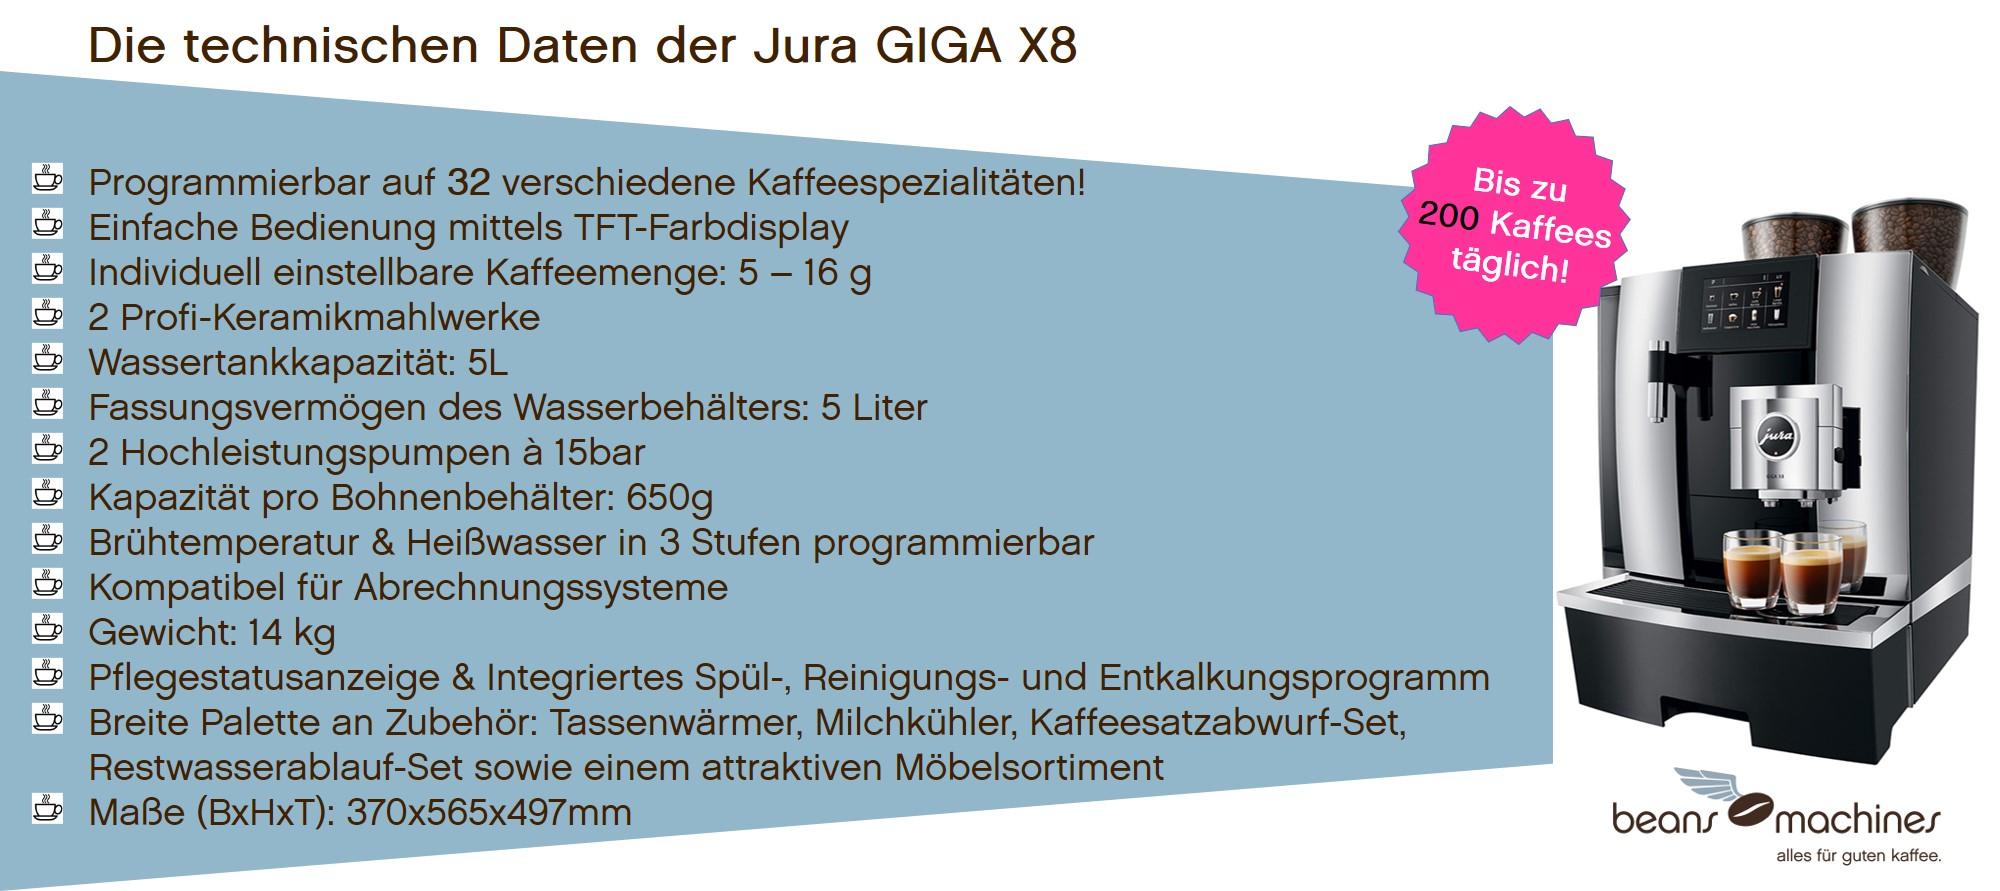 Jura Giga X8_Schönbergers_BeansAndMachines.jpg